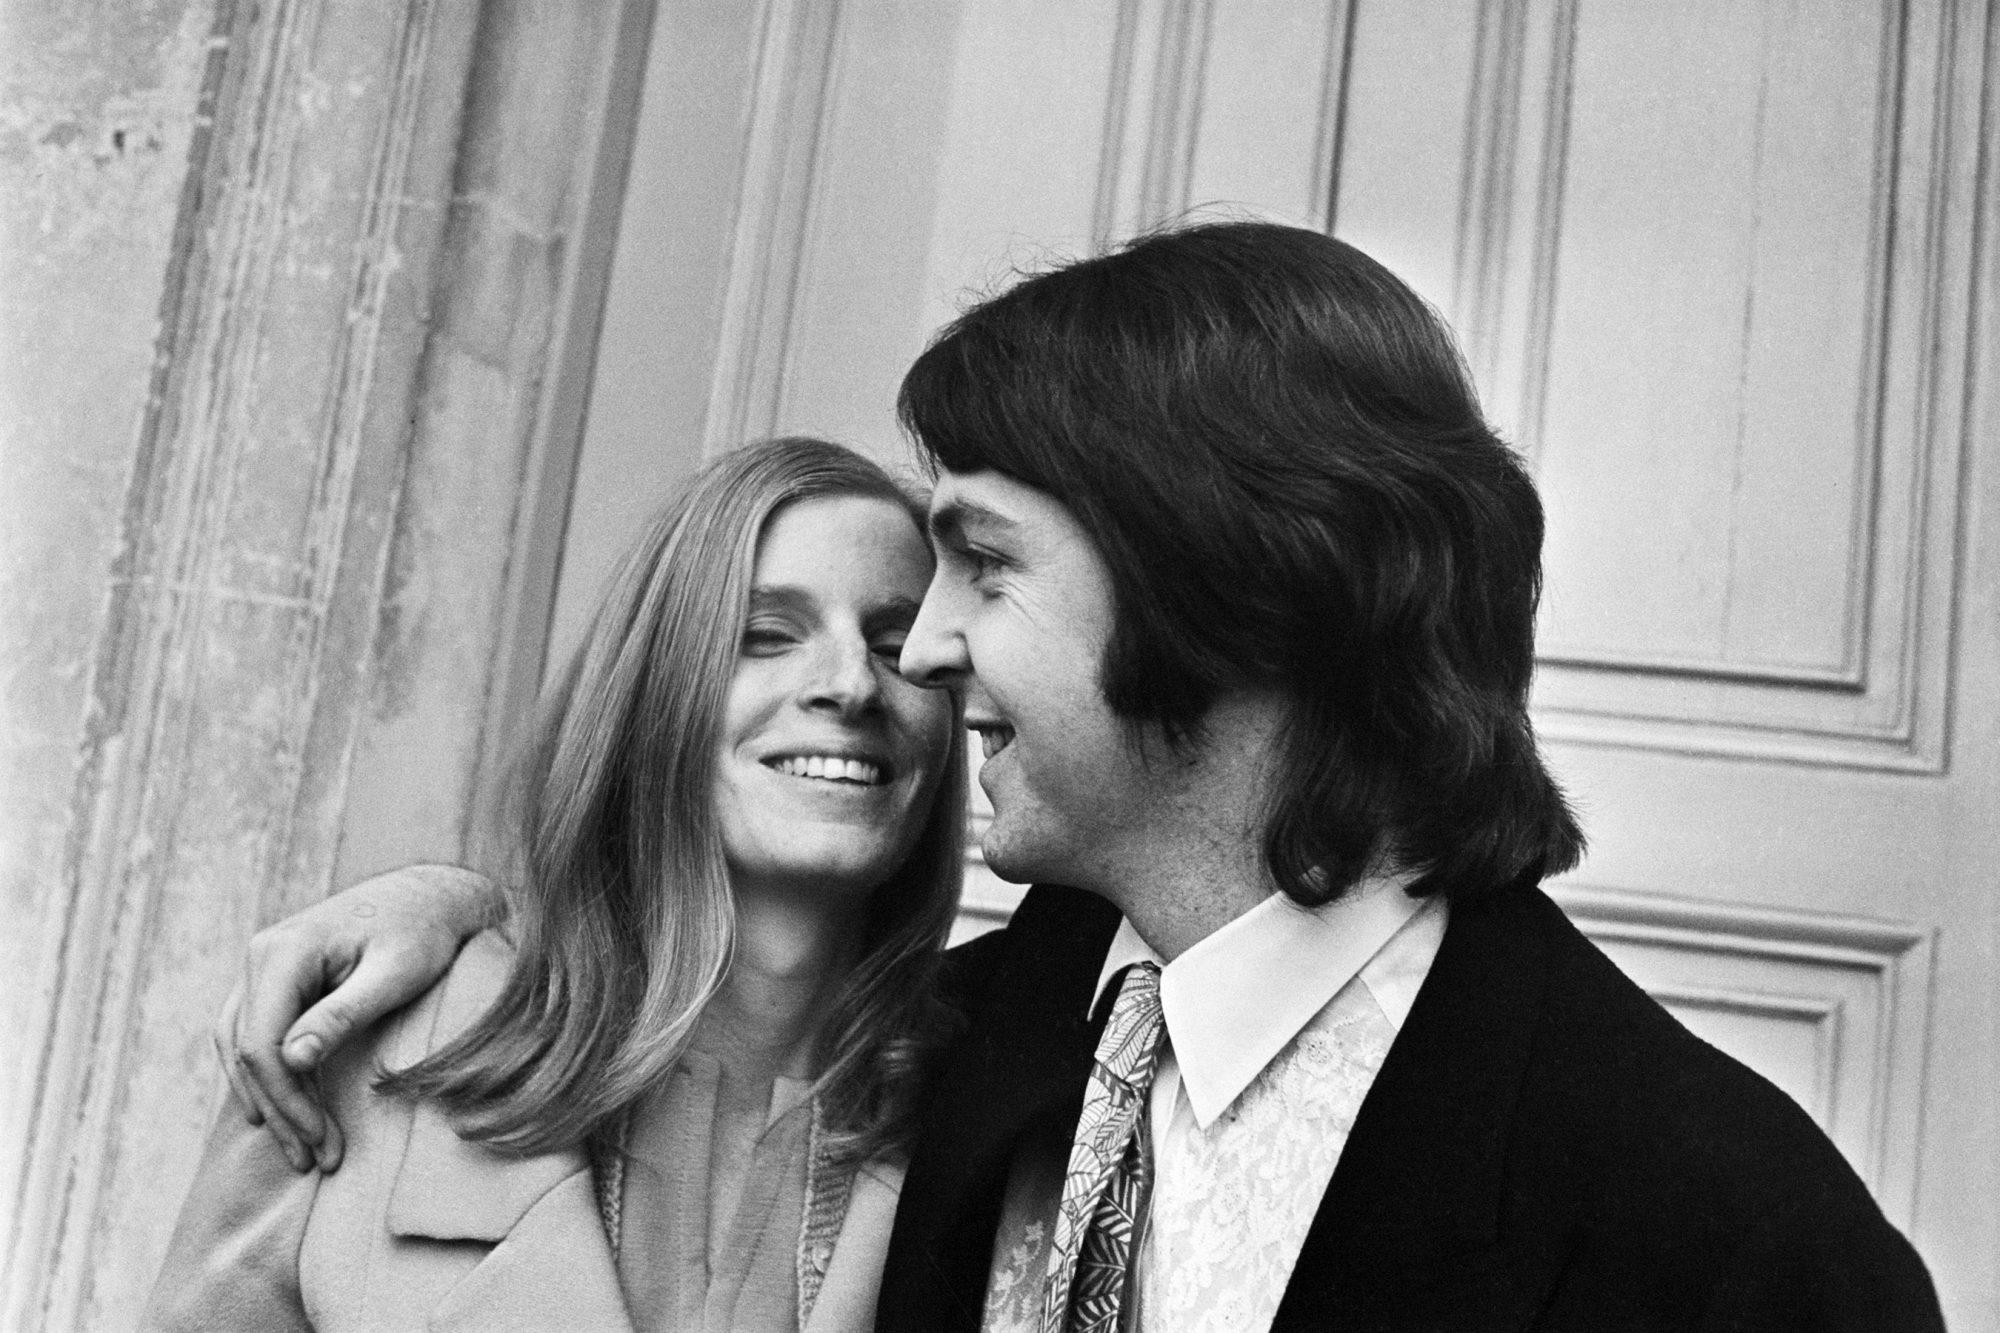 McCartney Marries